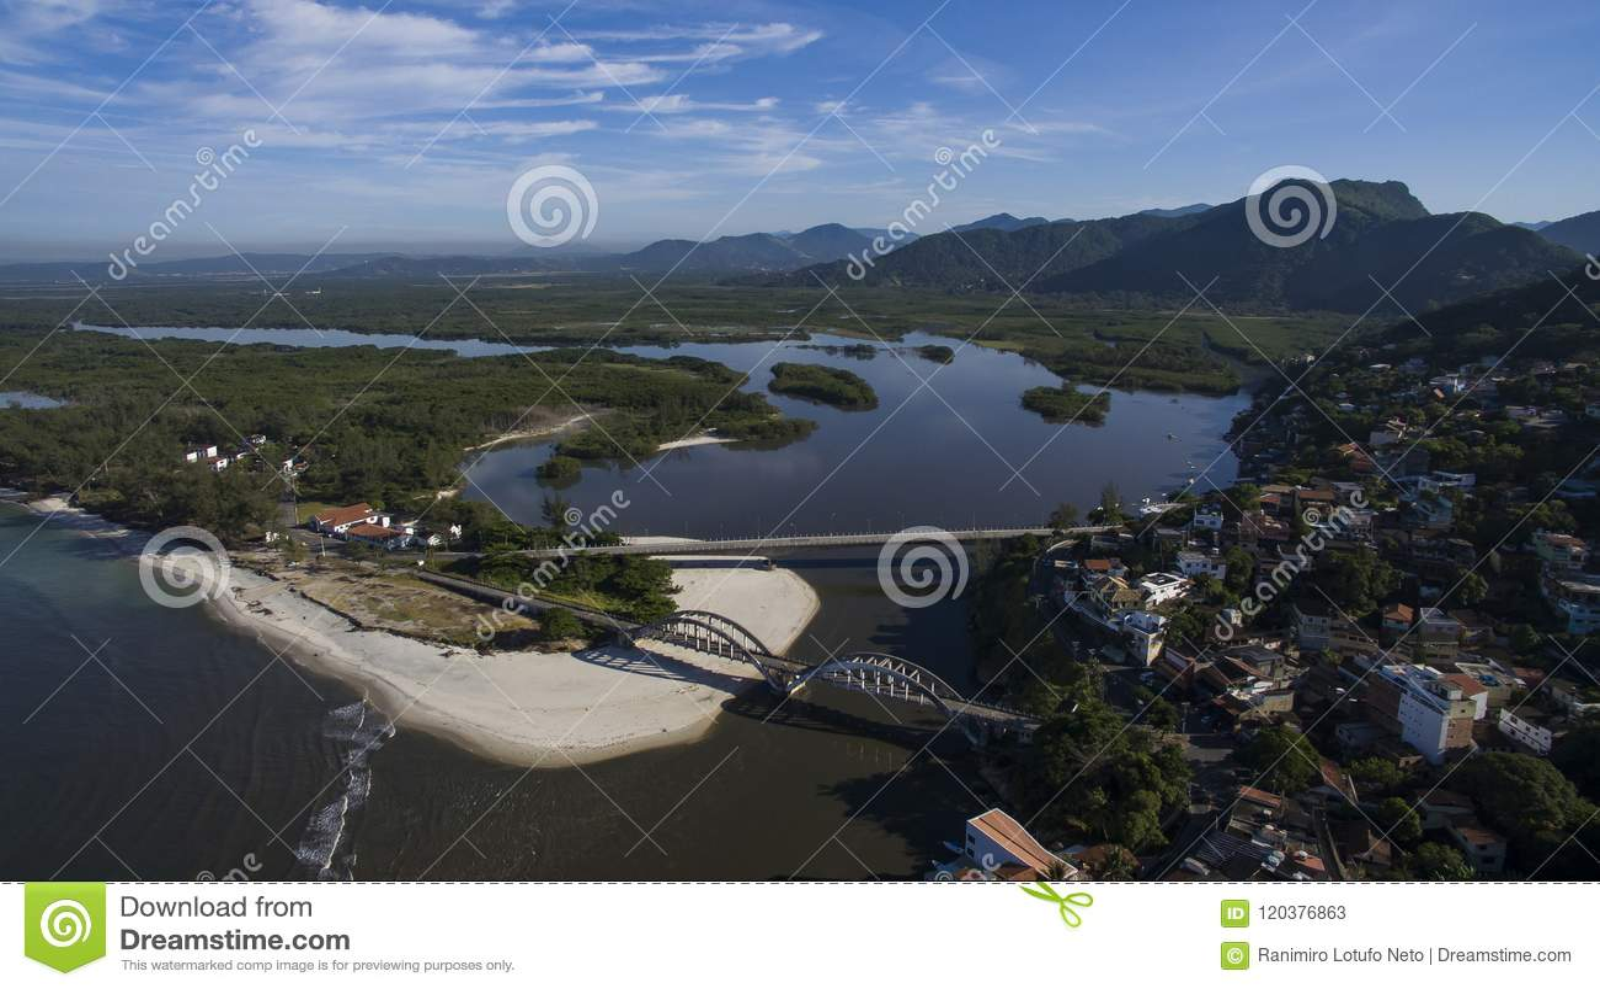 Plaże i paradisiacal miejsca, cudowne plaże dookoła świata, Restinga Marambaia plaża, Rio De Janeiro, Brazylia